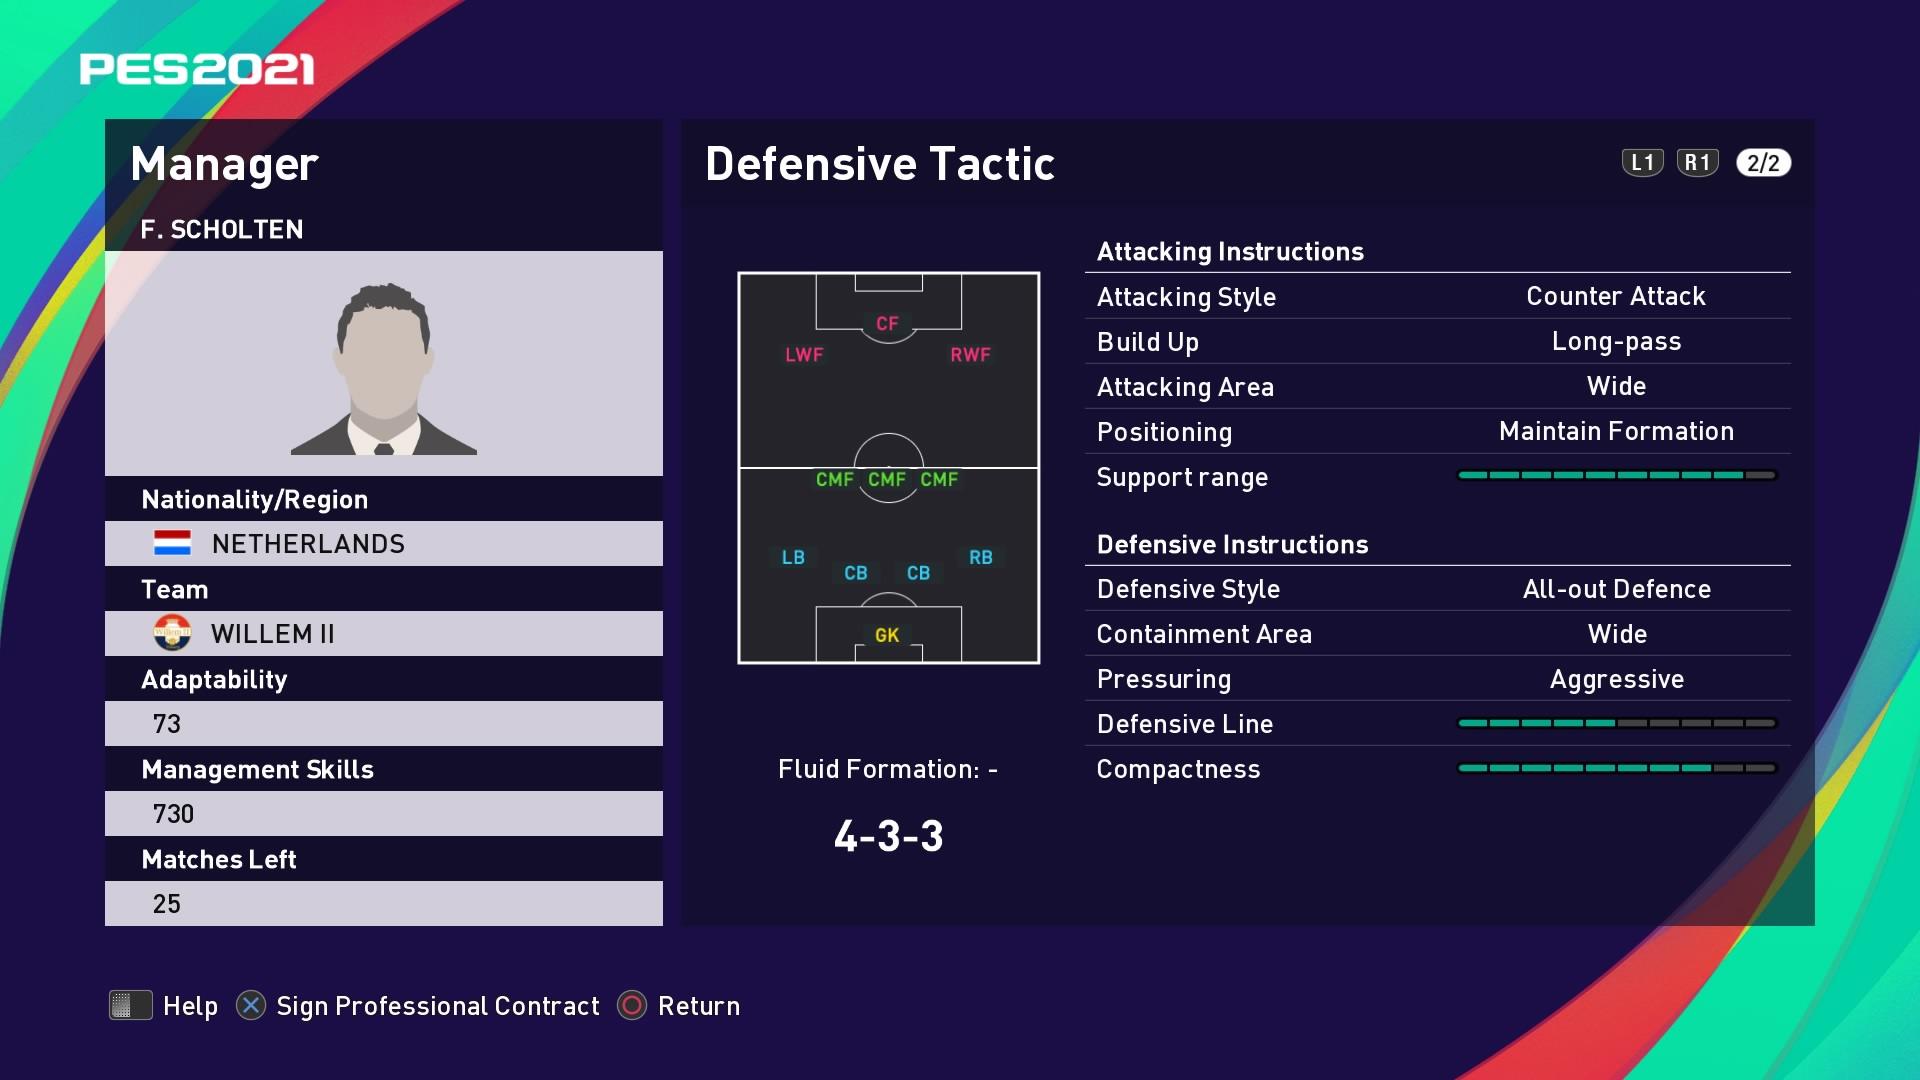 F. Scholten (Adrie Koster) Defensive Tactic in PES 2021 myClub